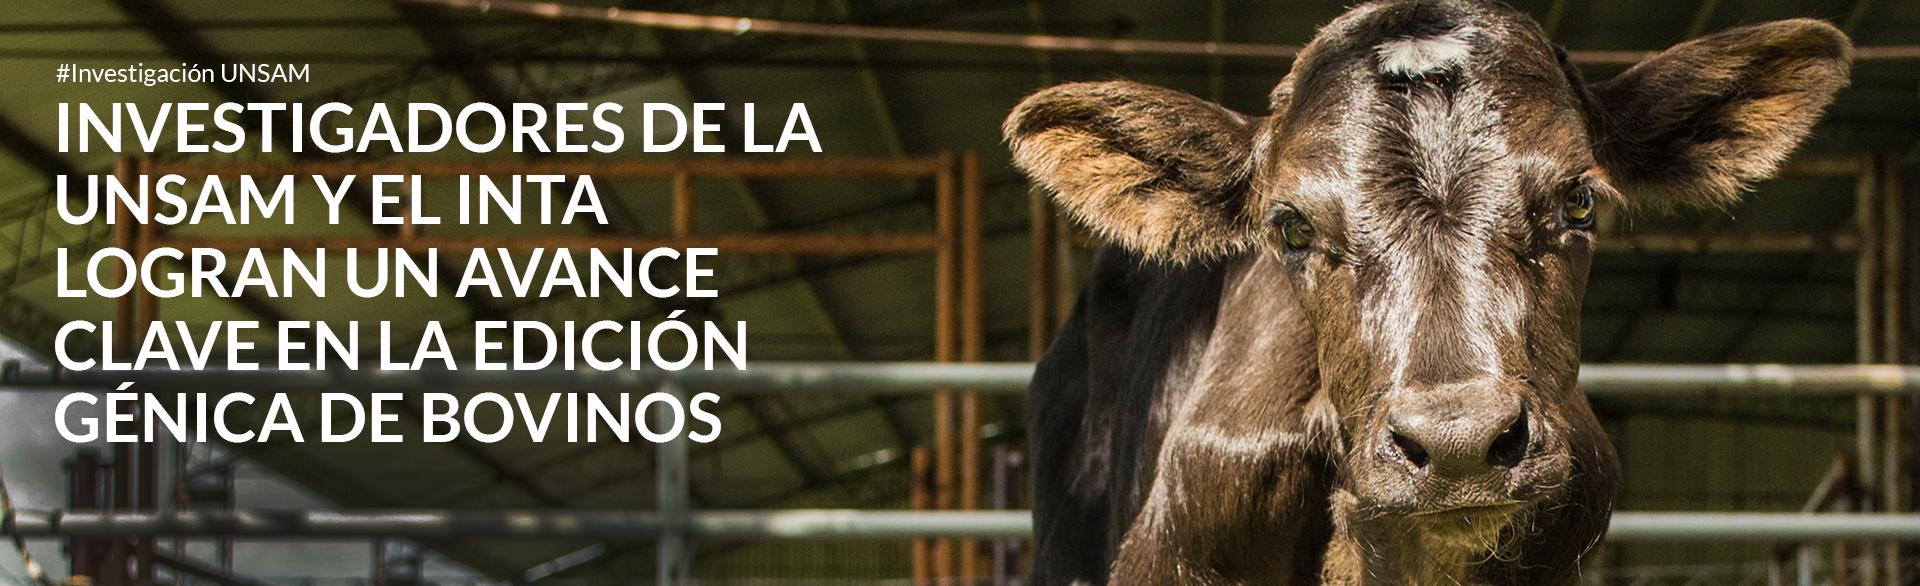 Vacas que producen leche hipoalergénica